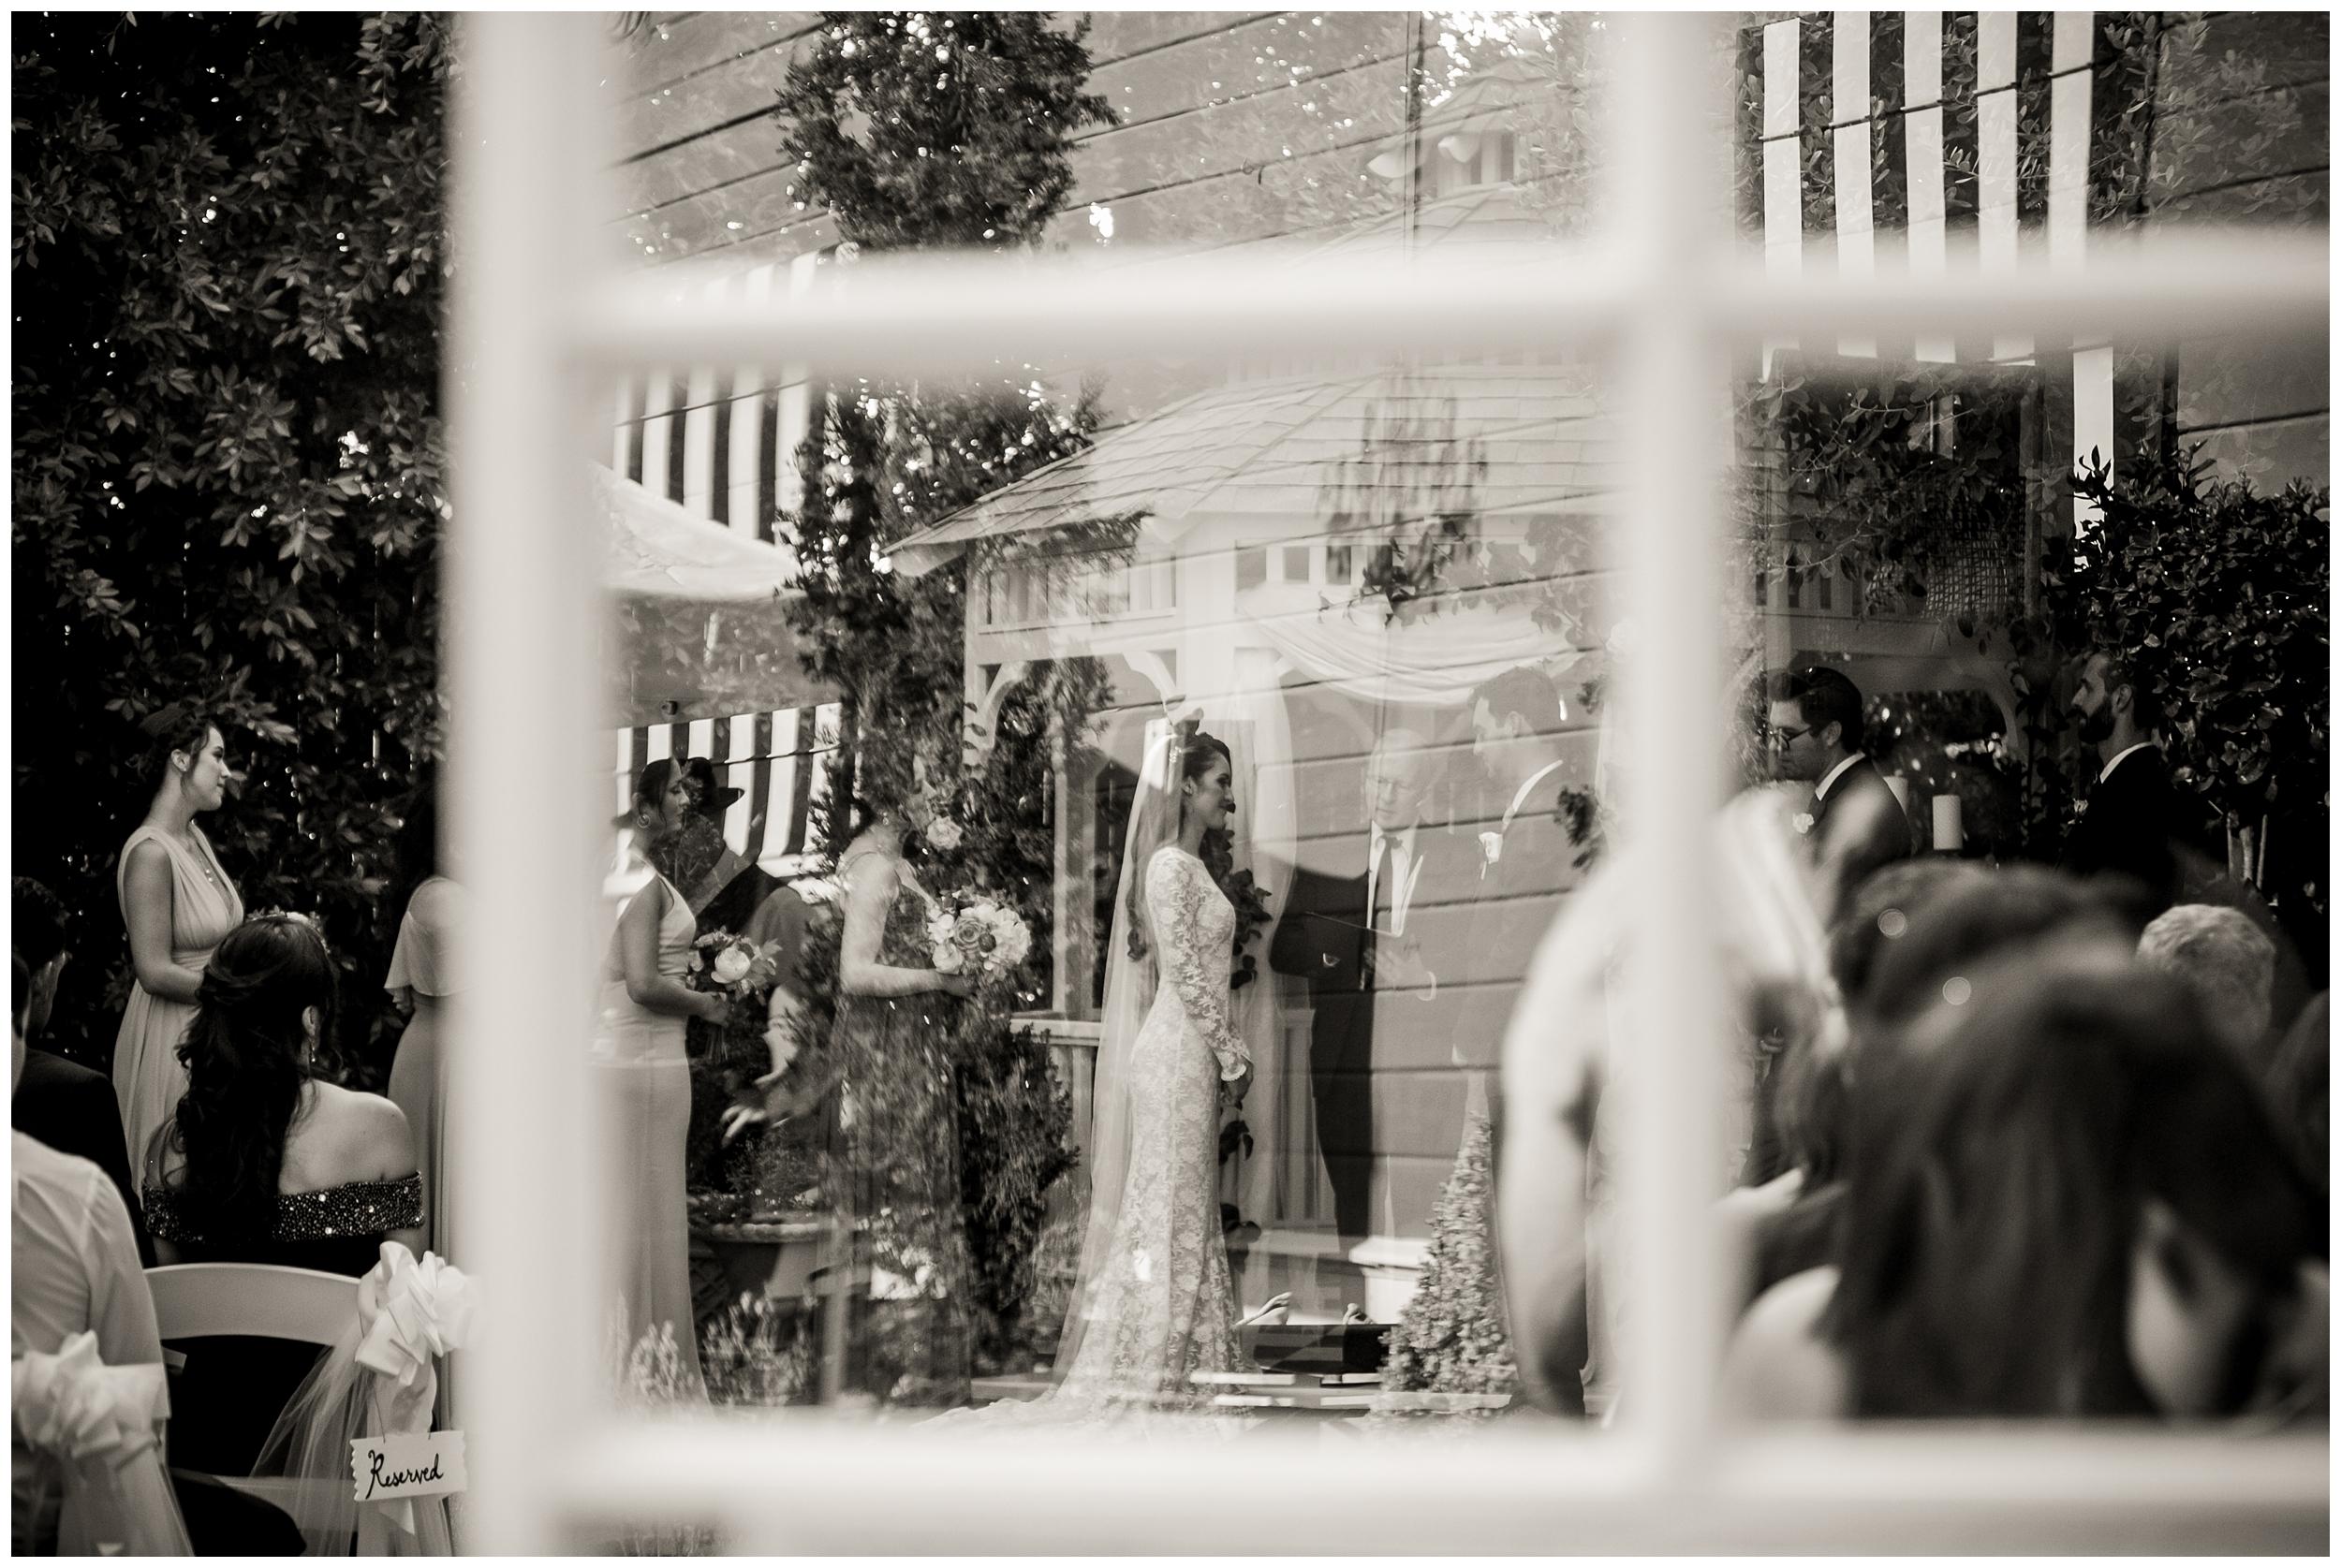 chic-christmas-house-wedding-ceremony-carrie-vines-012.jpg